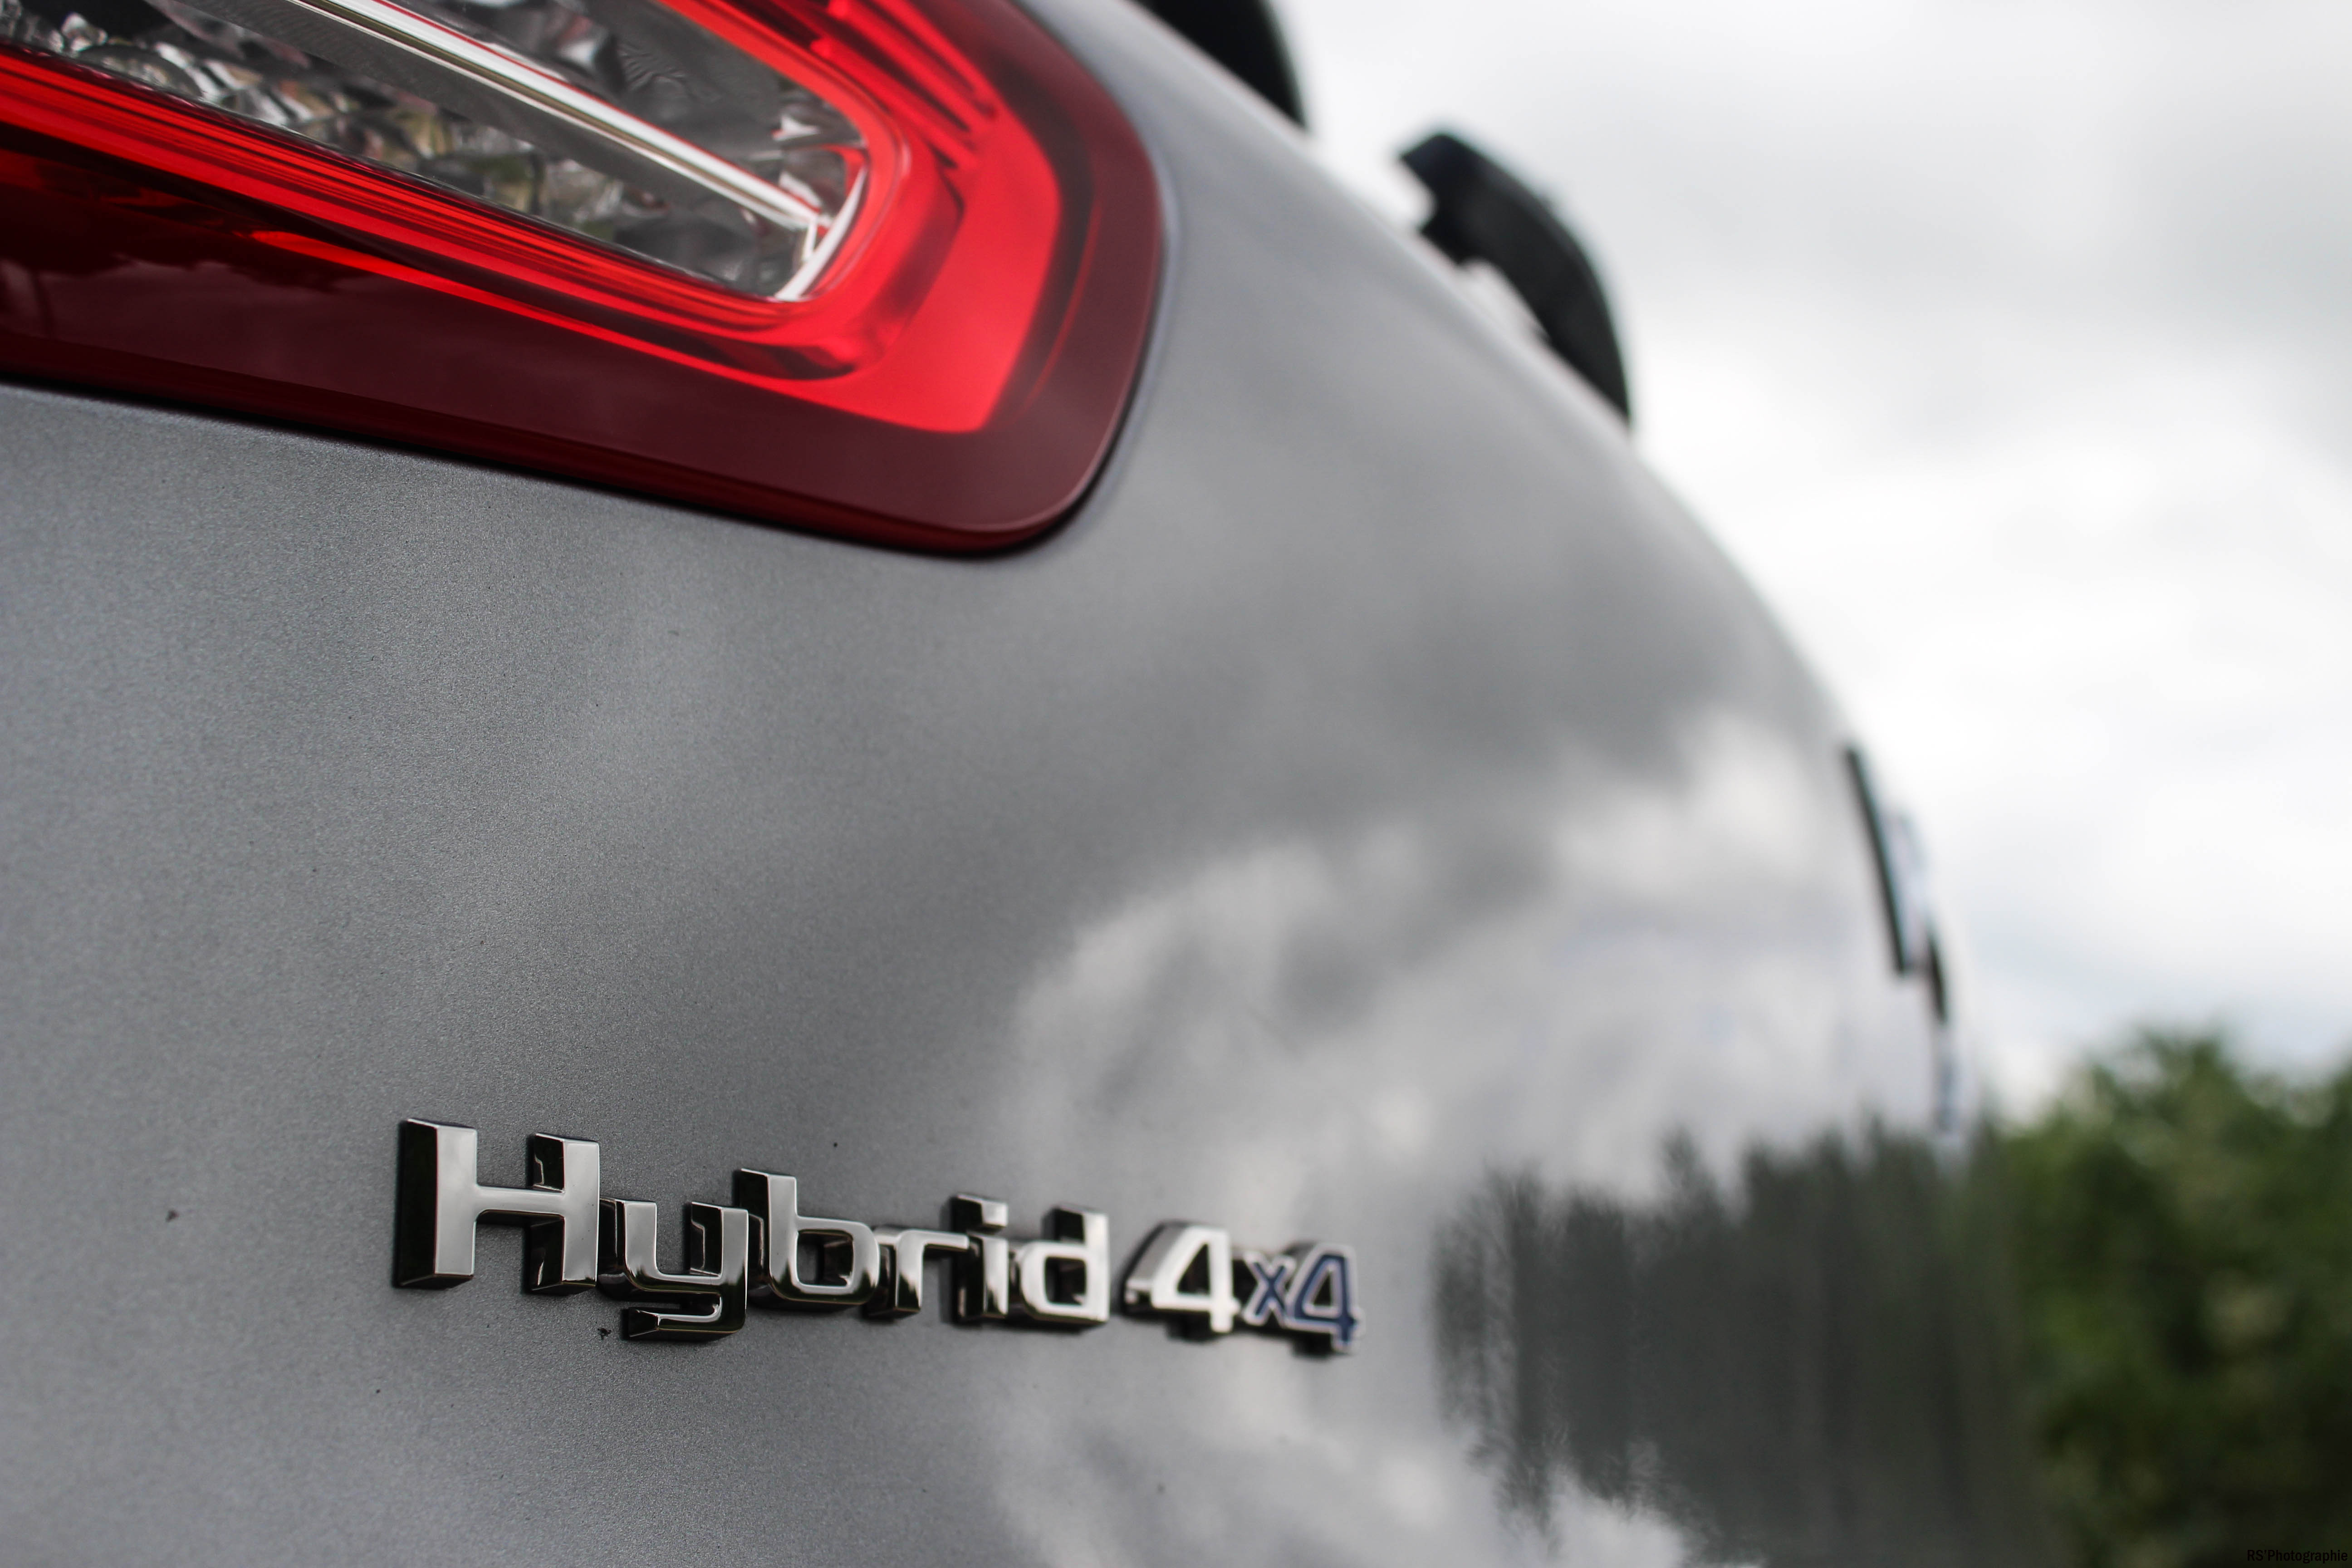 ds5hybrid3-ds5-hybrid4-logo-Arnaud Demasier-RSPhotographie